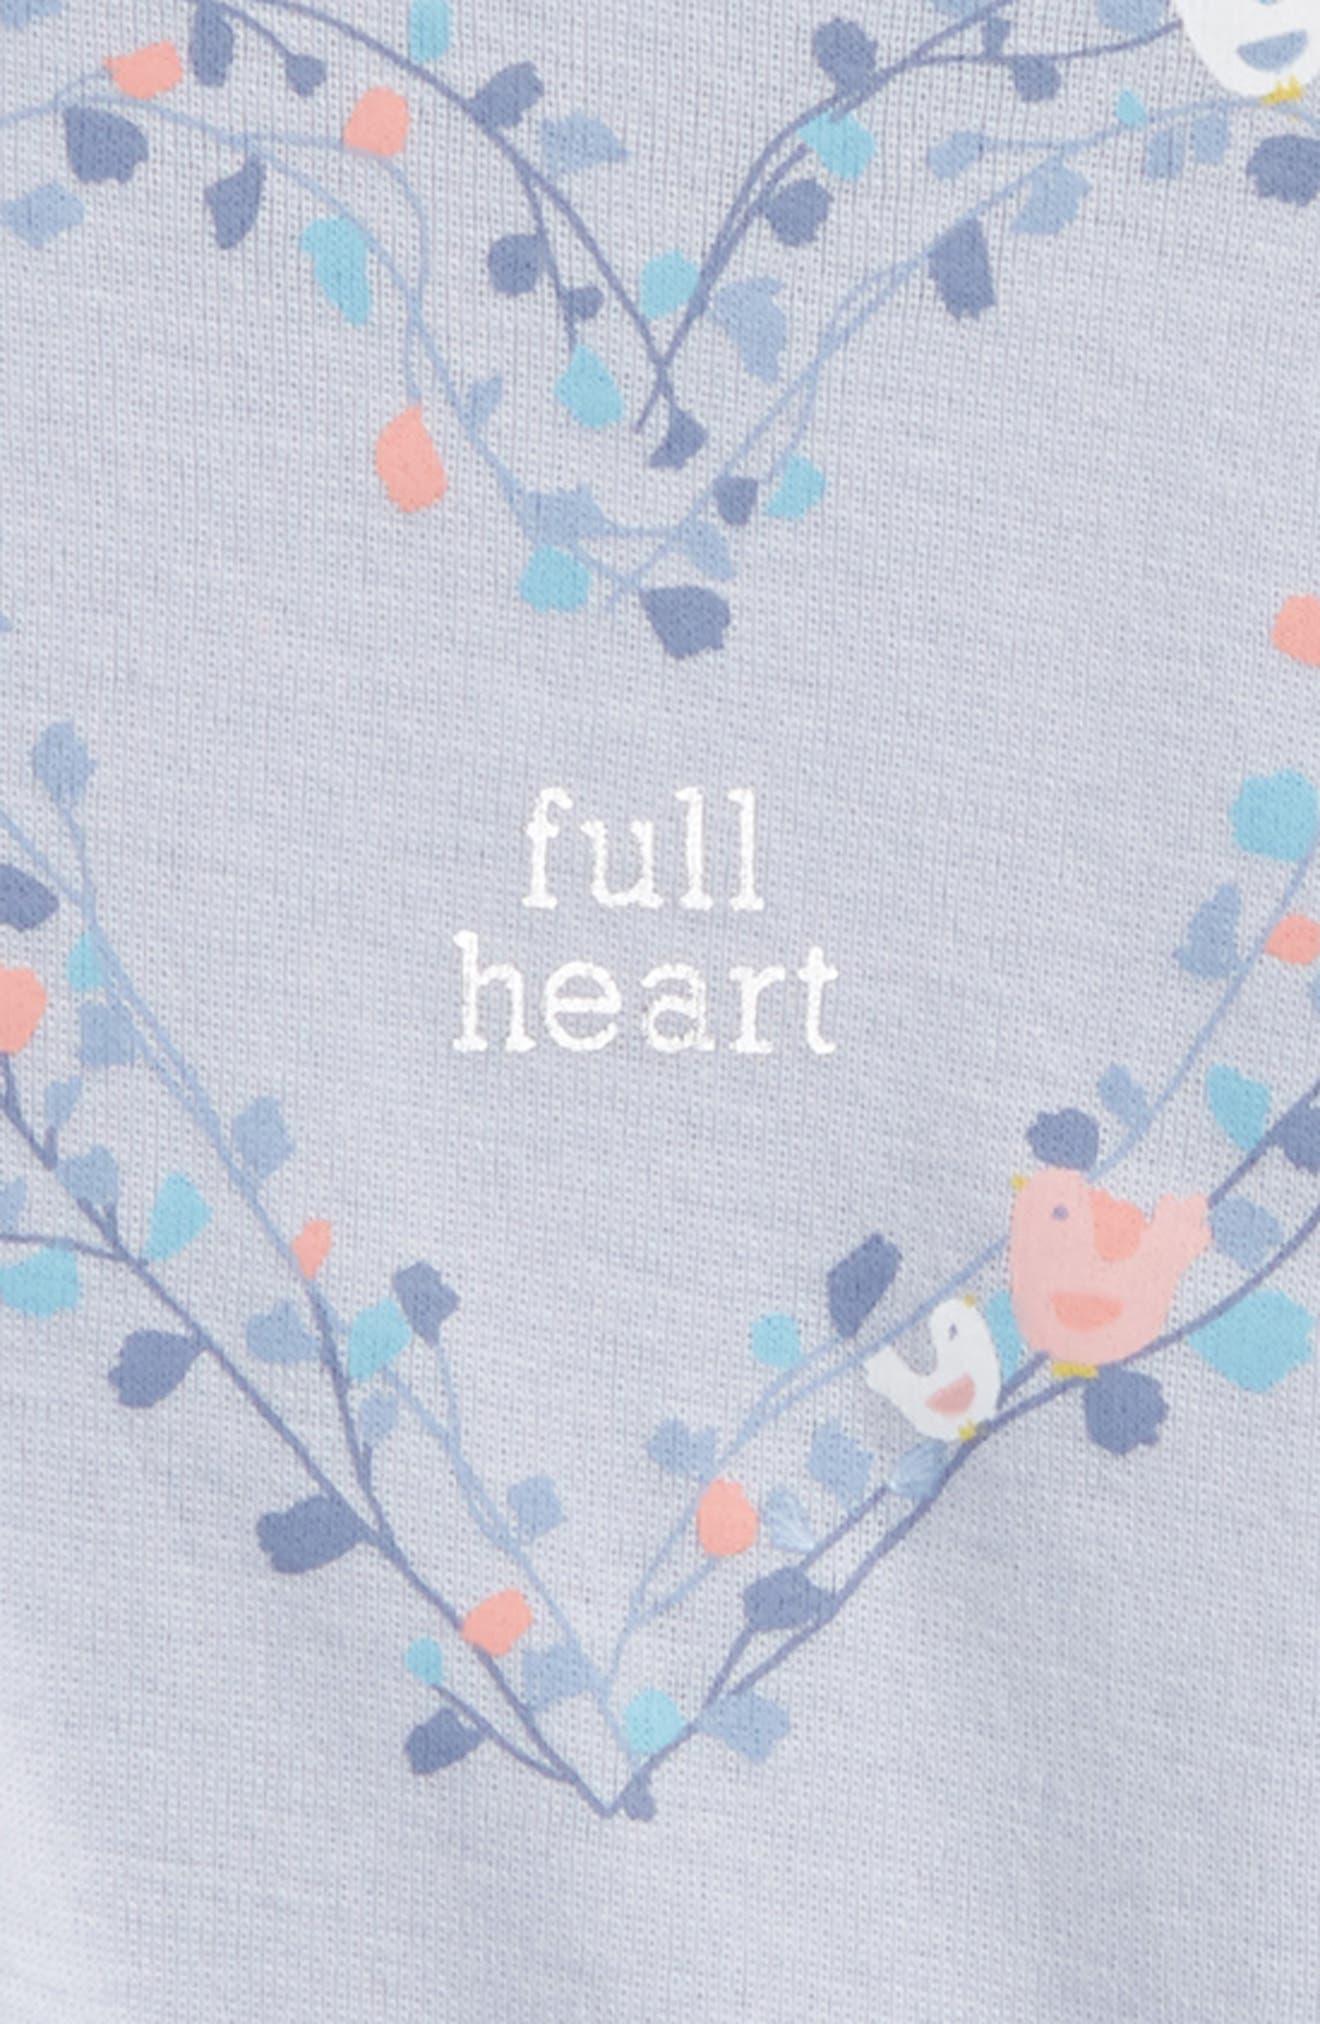 PEEK ESSENTIALS,                             Peek Full Heart Tee,                             Alternate thumbnail 2, color,                             429